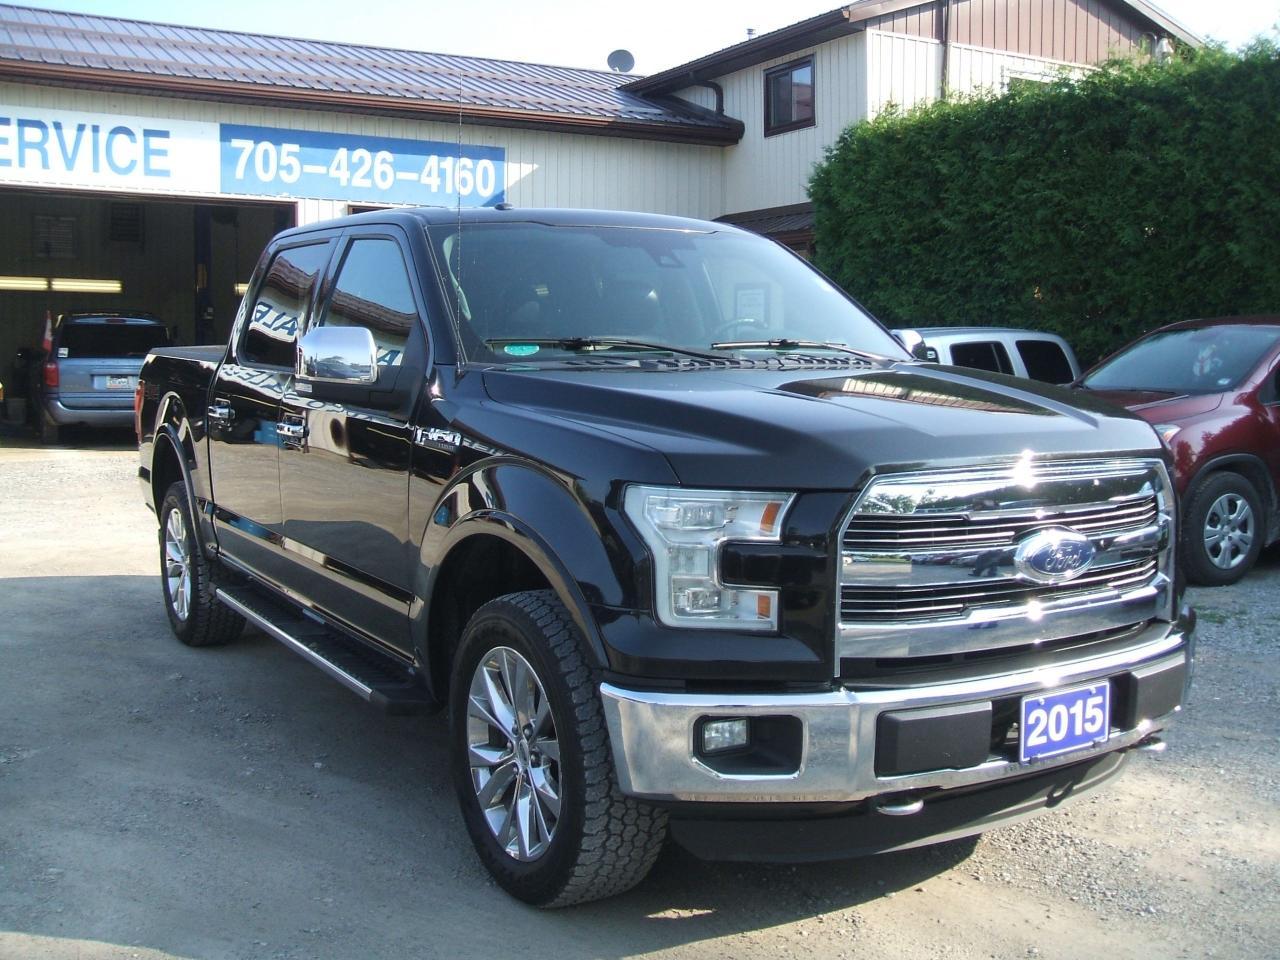 Photo of METALLIC BLACK 2015 Ford F-150